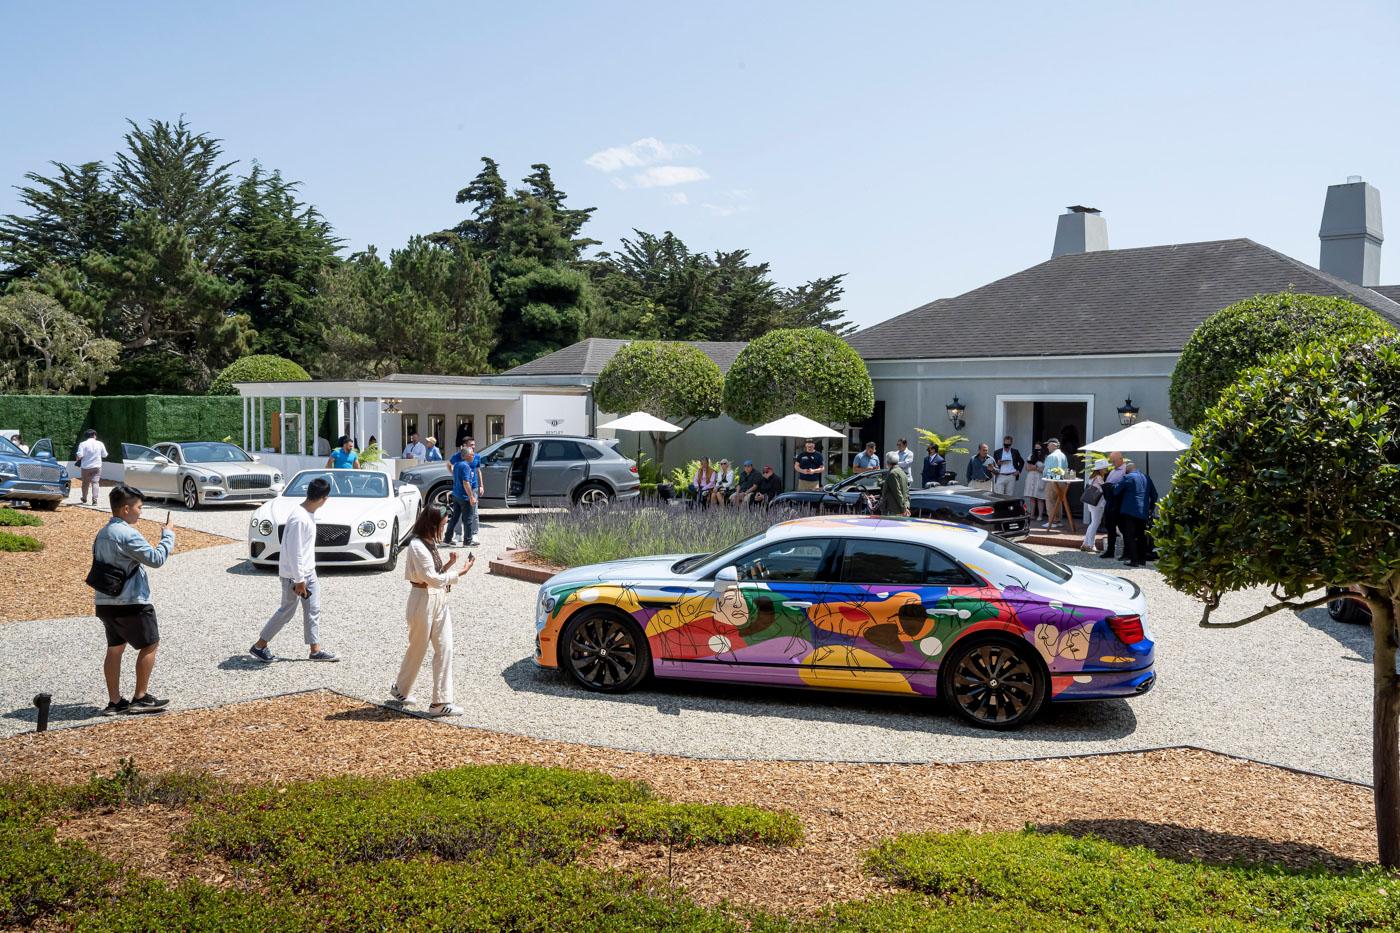 Nhin-lai-6-mau-bentley-an-tuong-nhat-tai-tuan-le-xe-hoi-Monterey-2021 (10).JPG